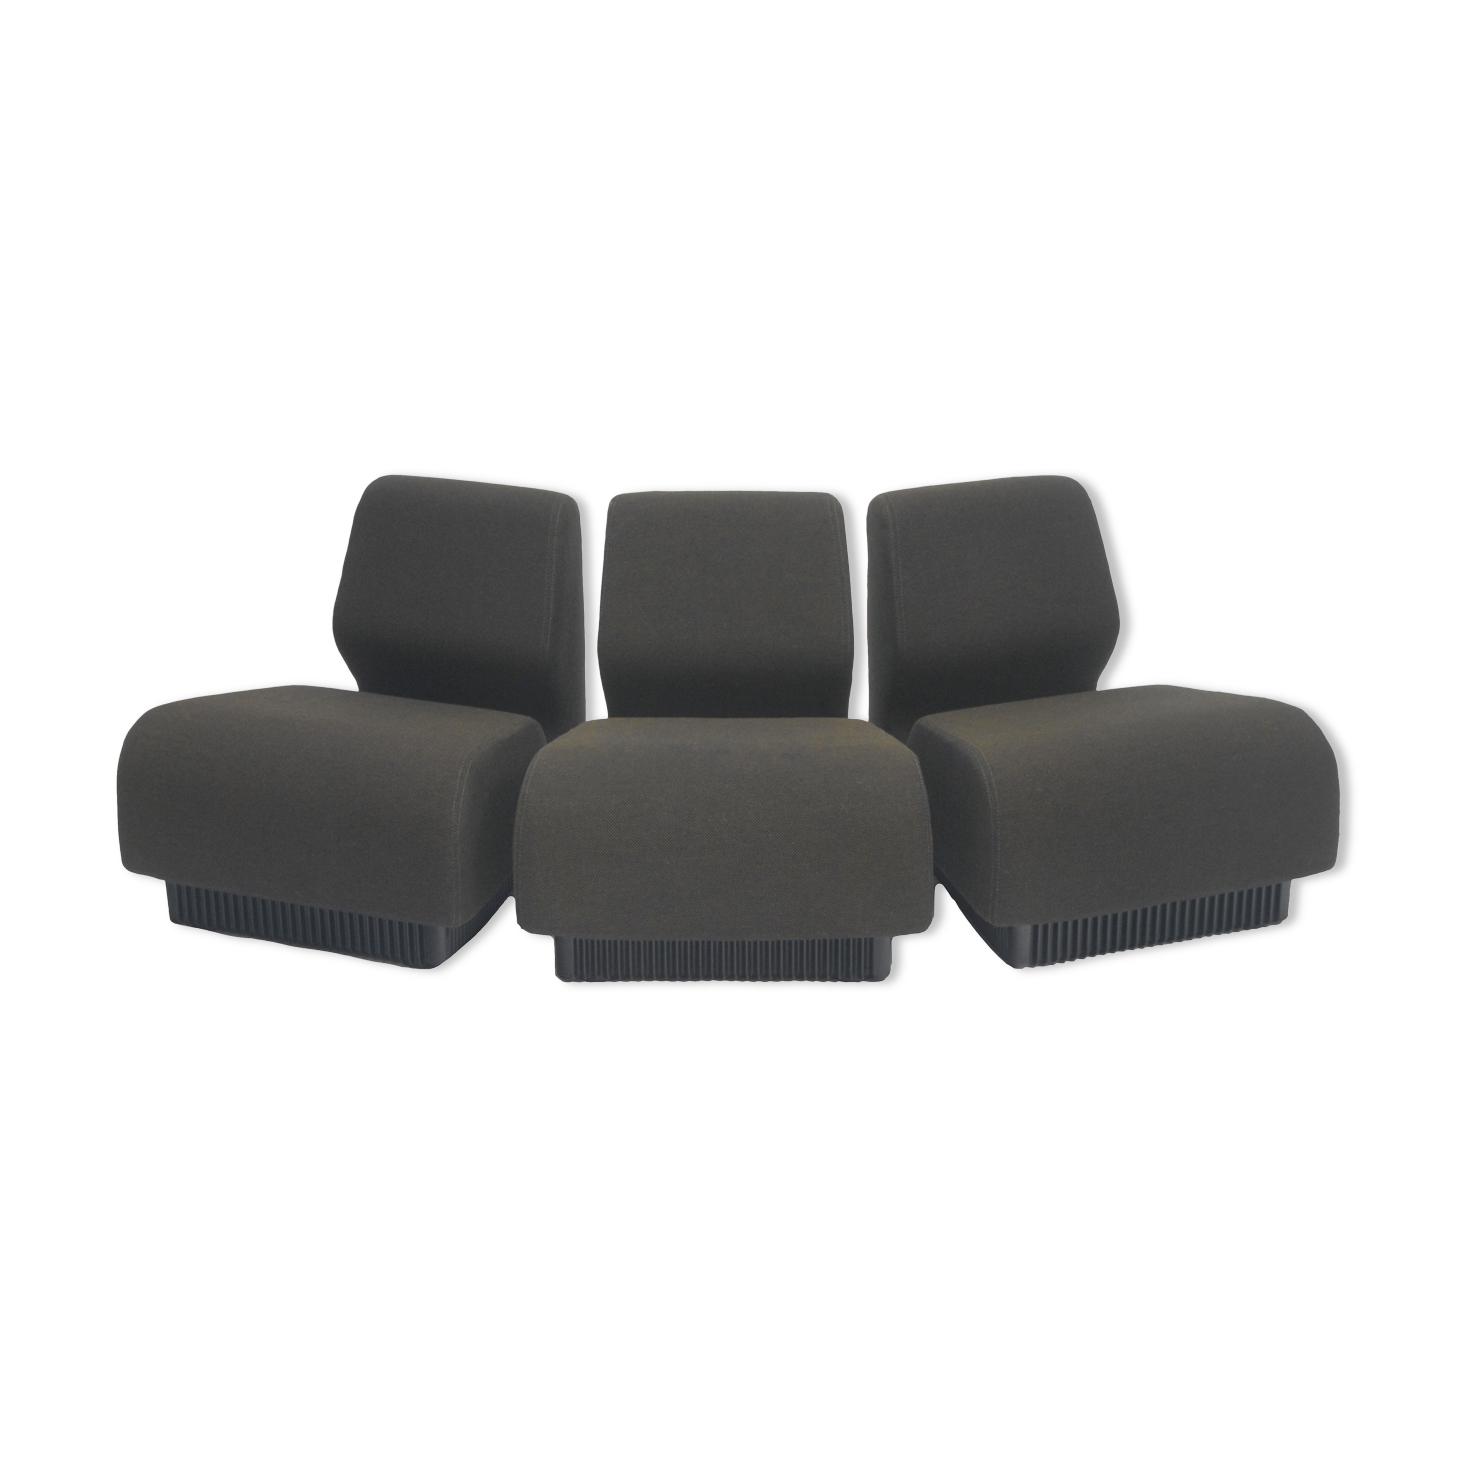 Canapé modulaire Don Chadwick pour Herman Miller